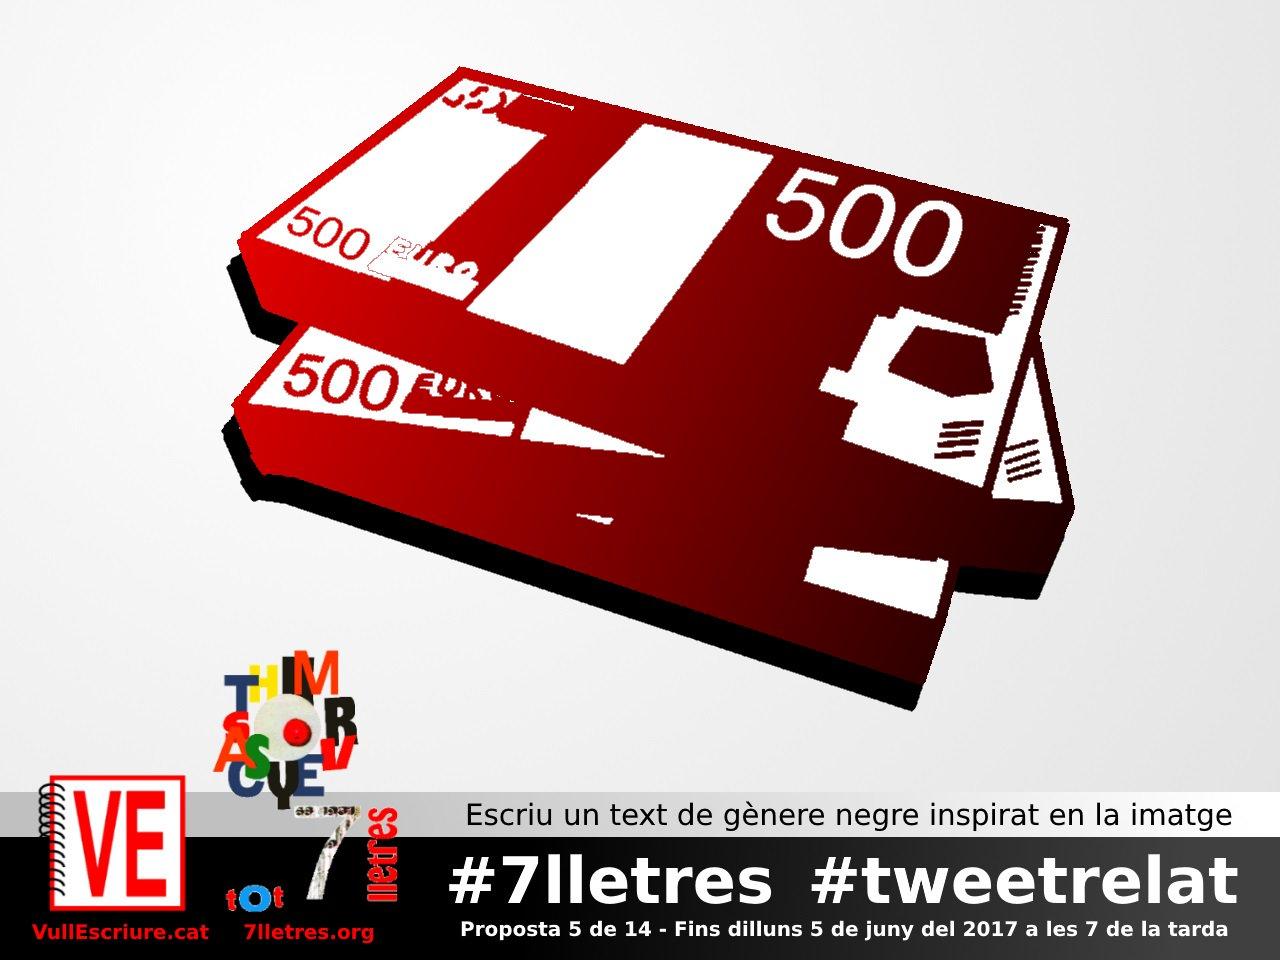 Thumbnail for VullEscriure - Marató #7lletres #tweetrelat (3a setmana)